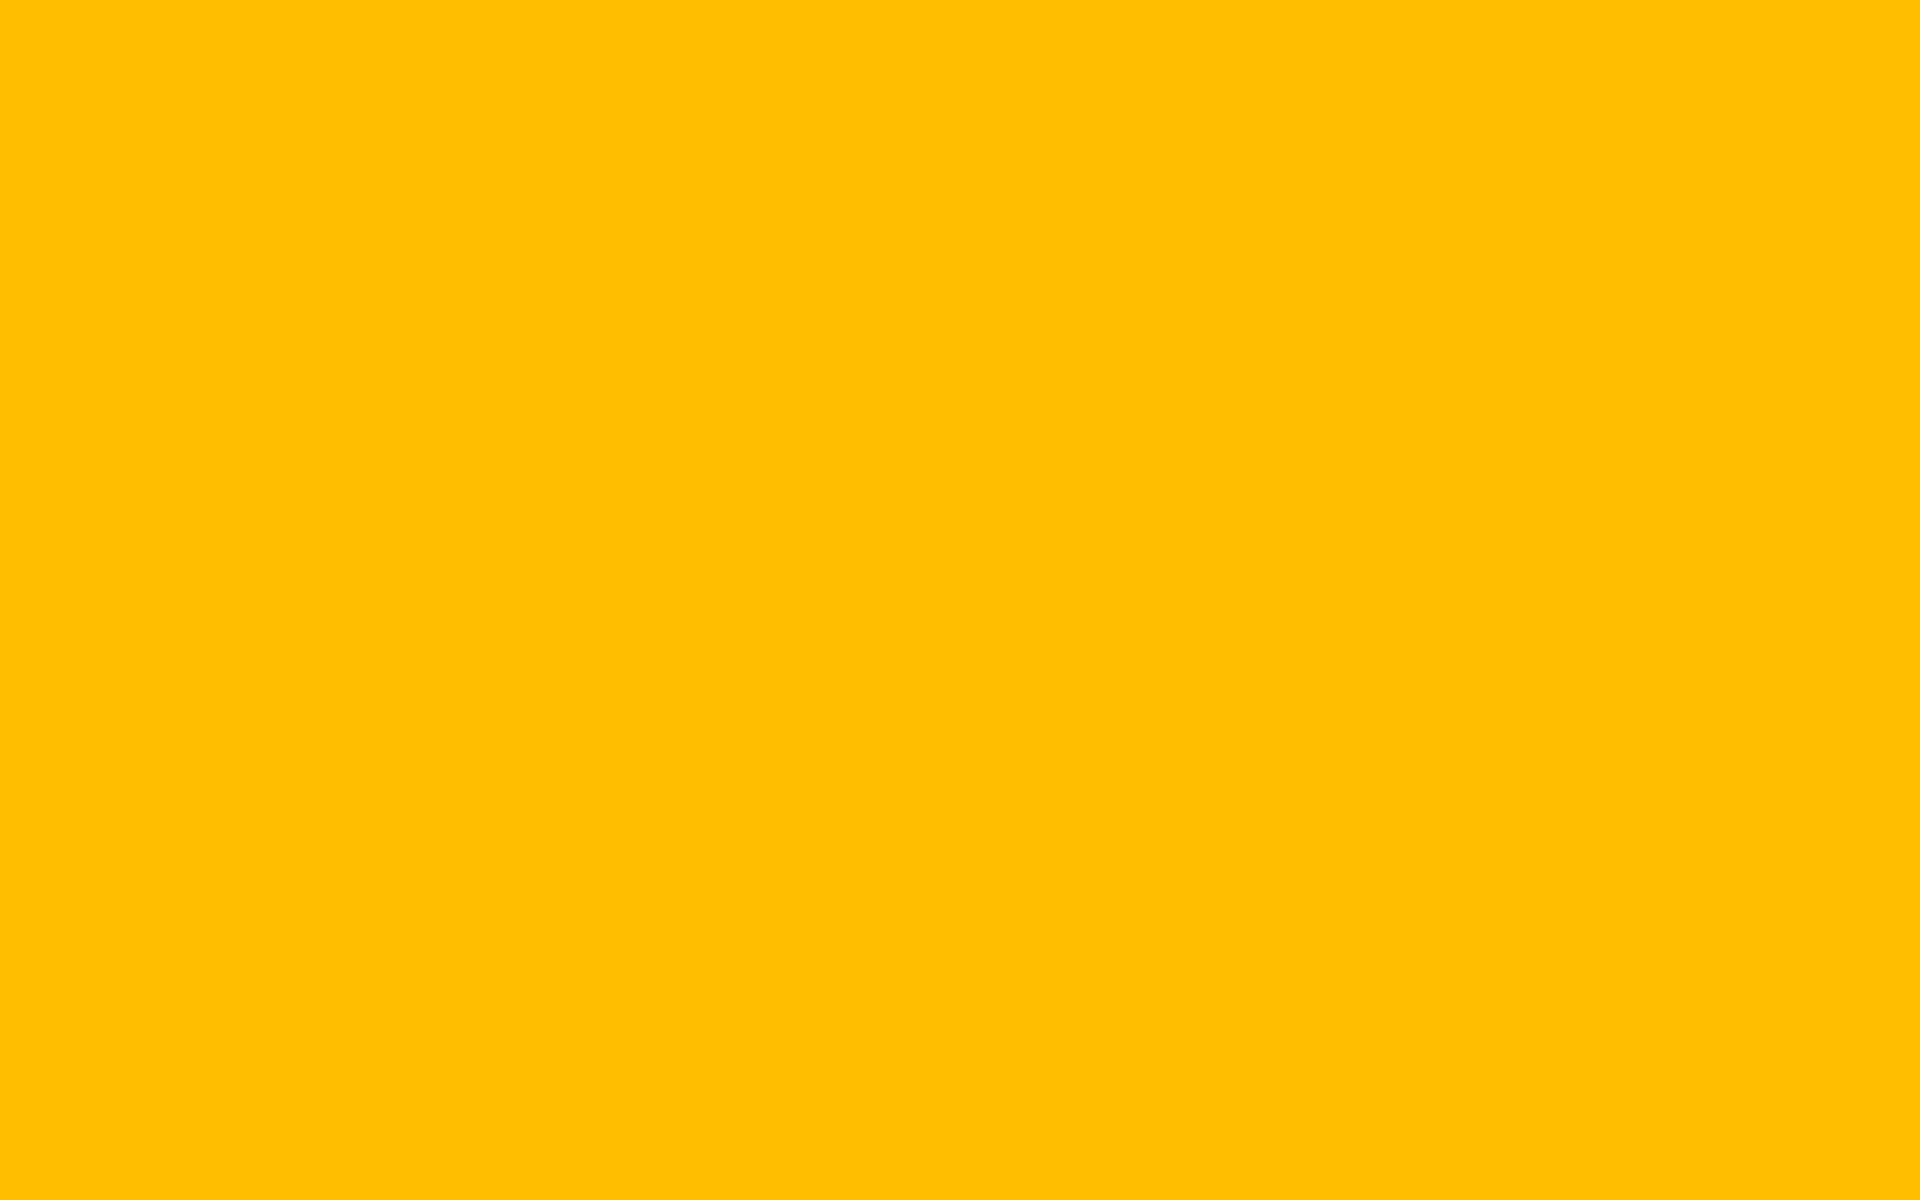 plain yellow color backgrounds wwwpixsharkcom images